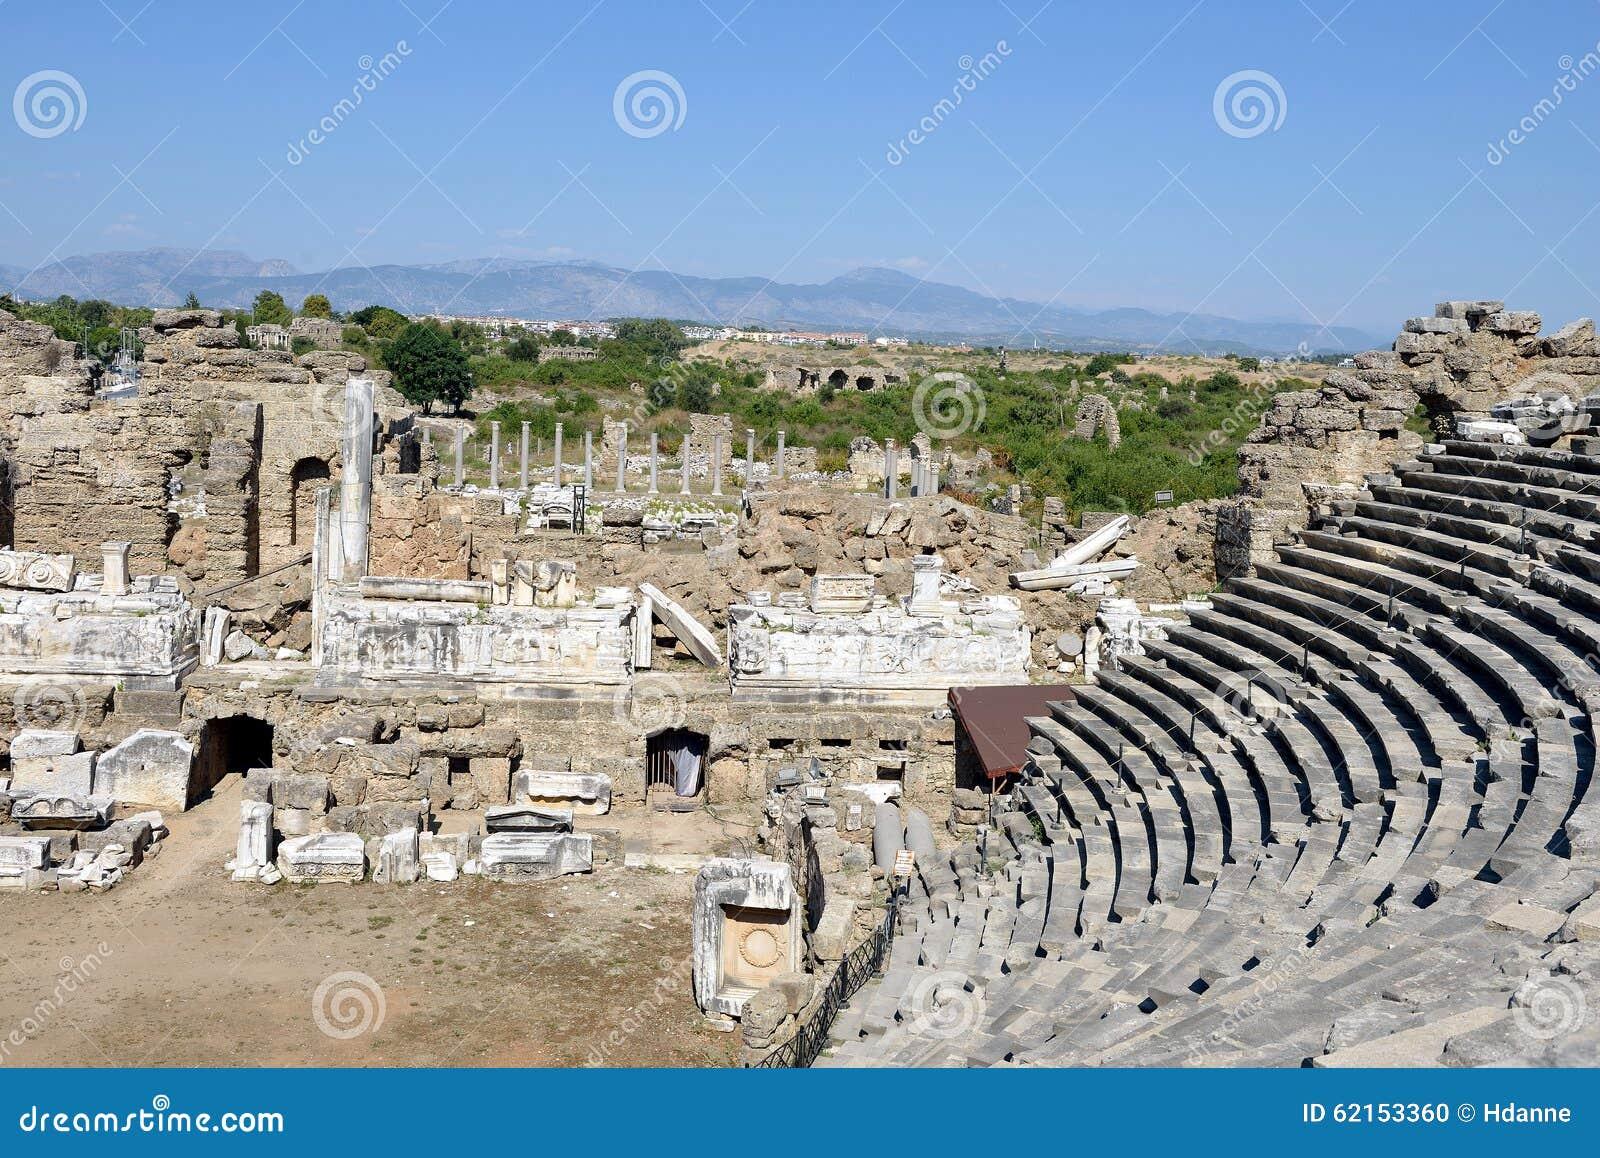 Greek Amphitheater, Side Stock Photo - Image: 62153360